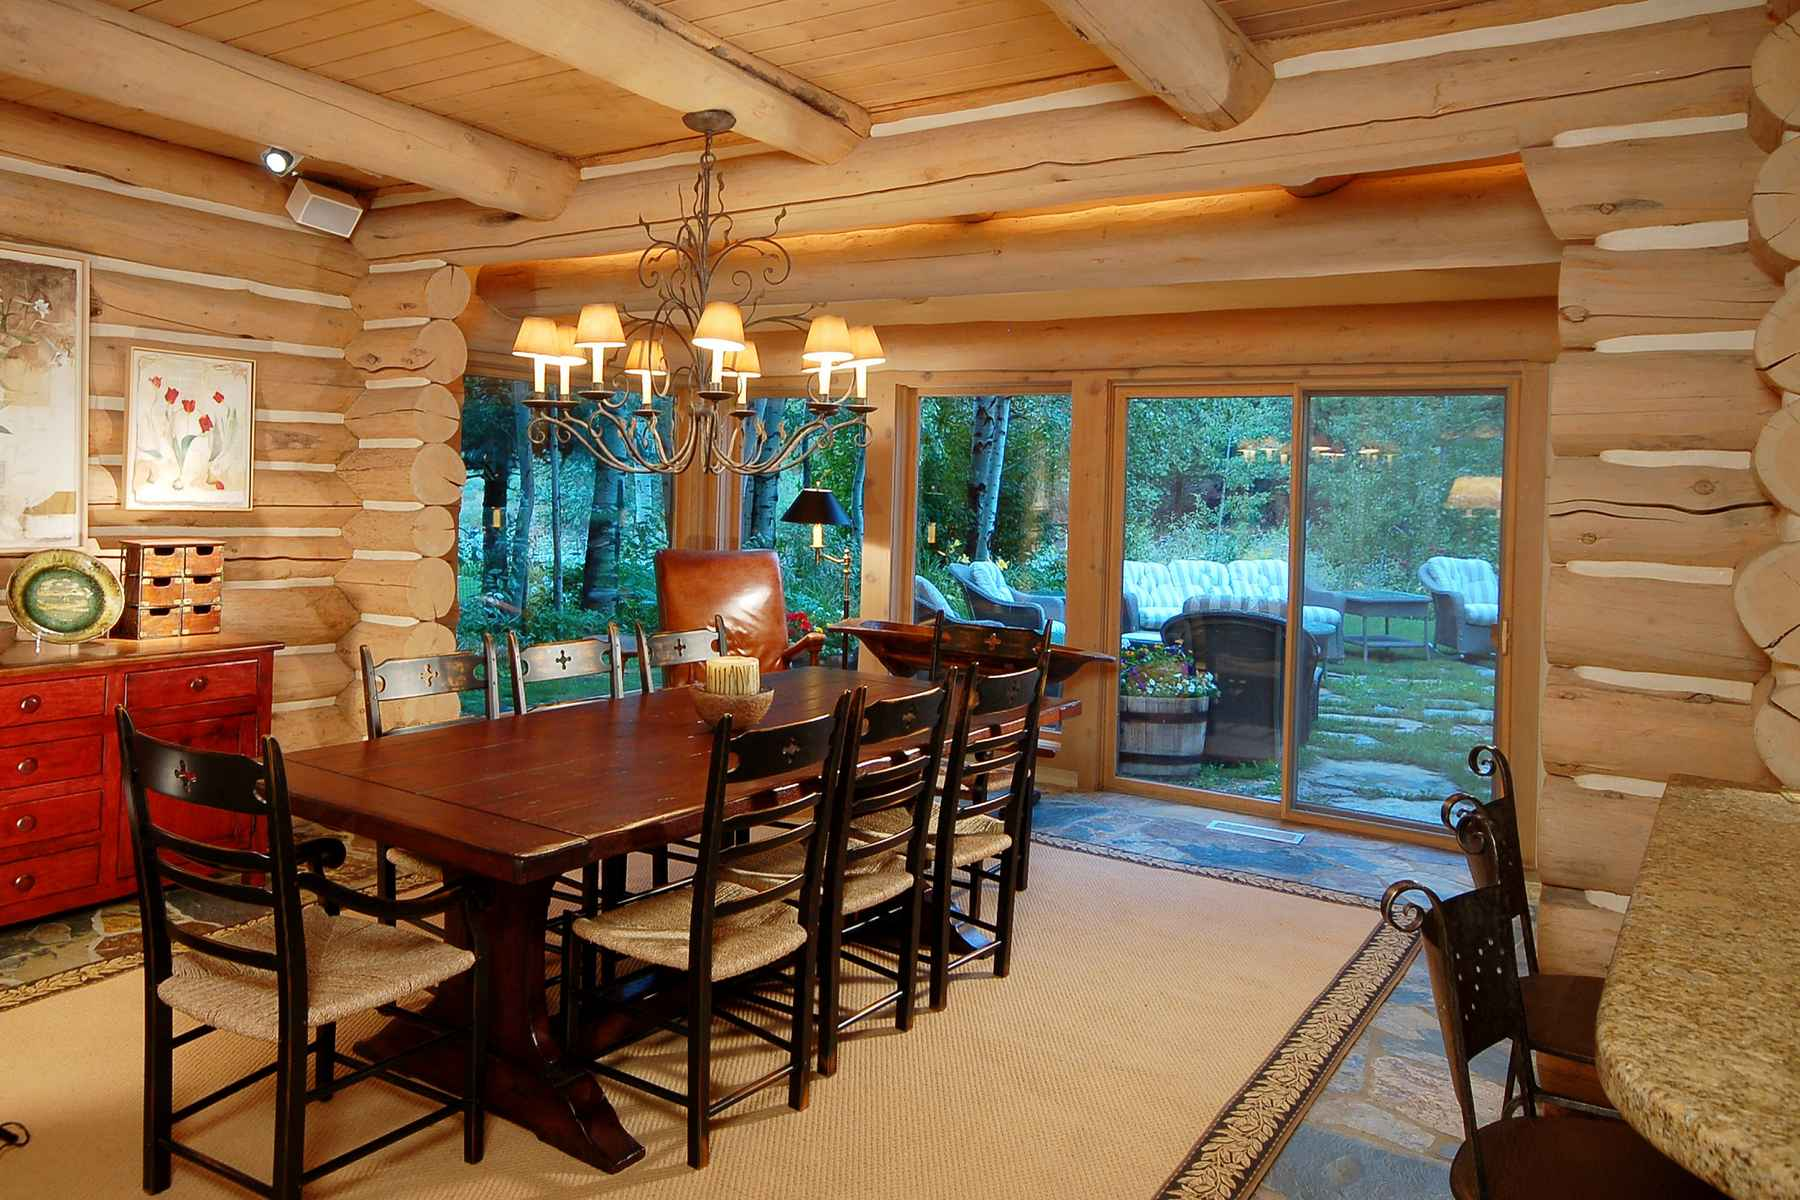 Additional photo for property listing at Sweet Irene 130 Irene St. 凯彻姆, 爱达荷州 83340 美国